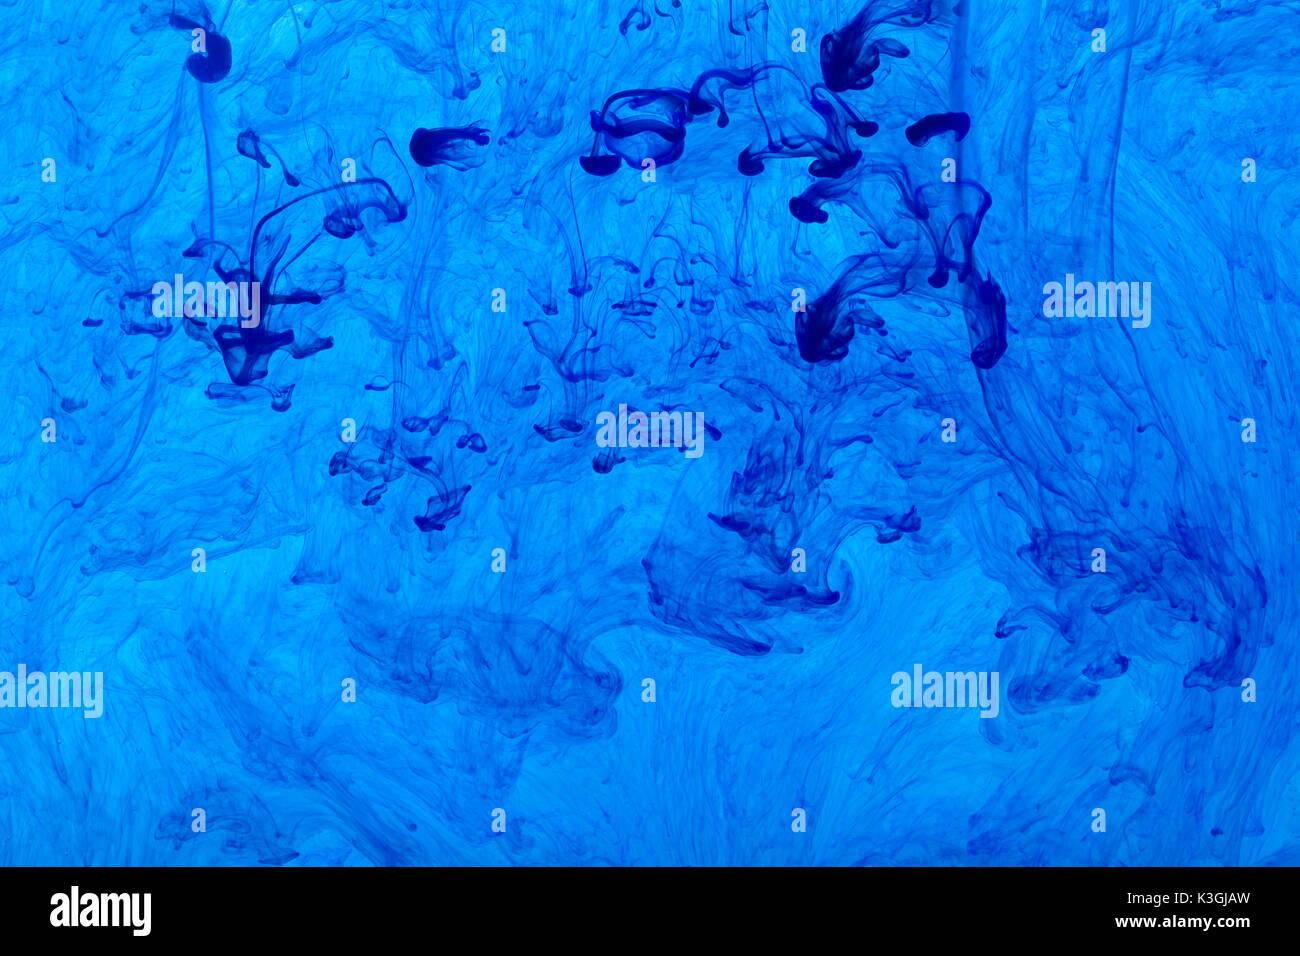 Pigmento Blu Immagini Pigmento Blu Fotos Stock Alamy